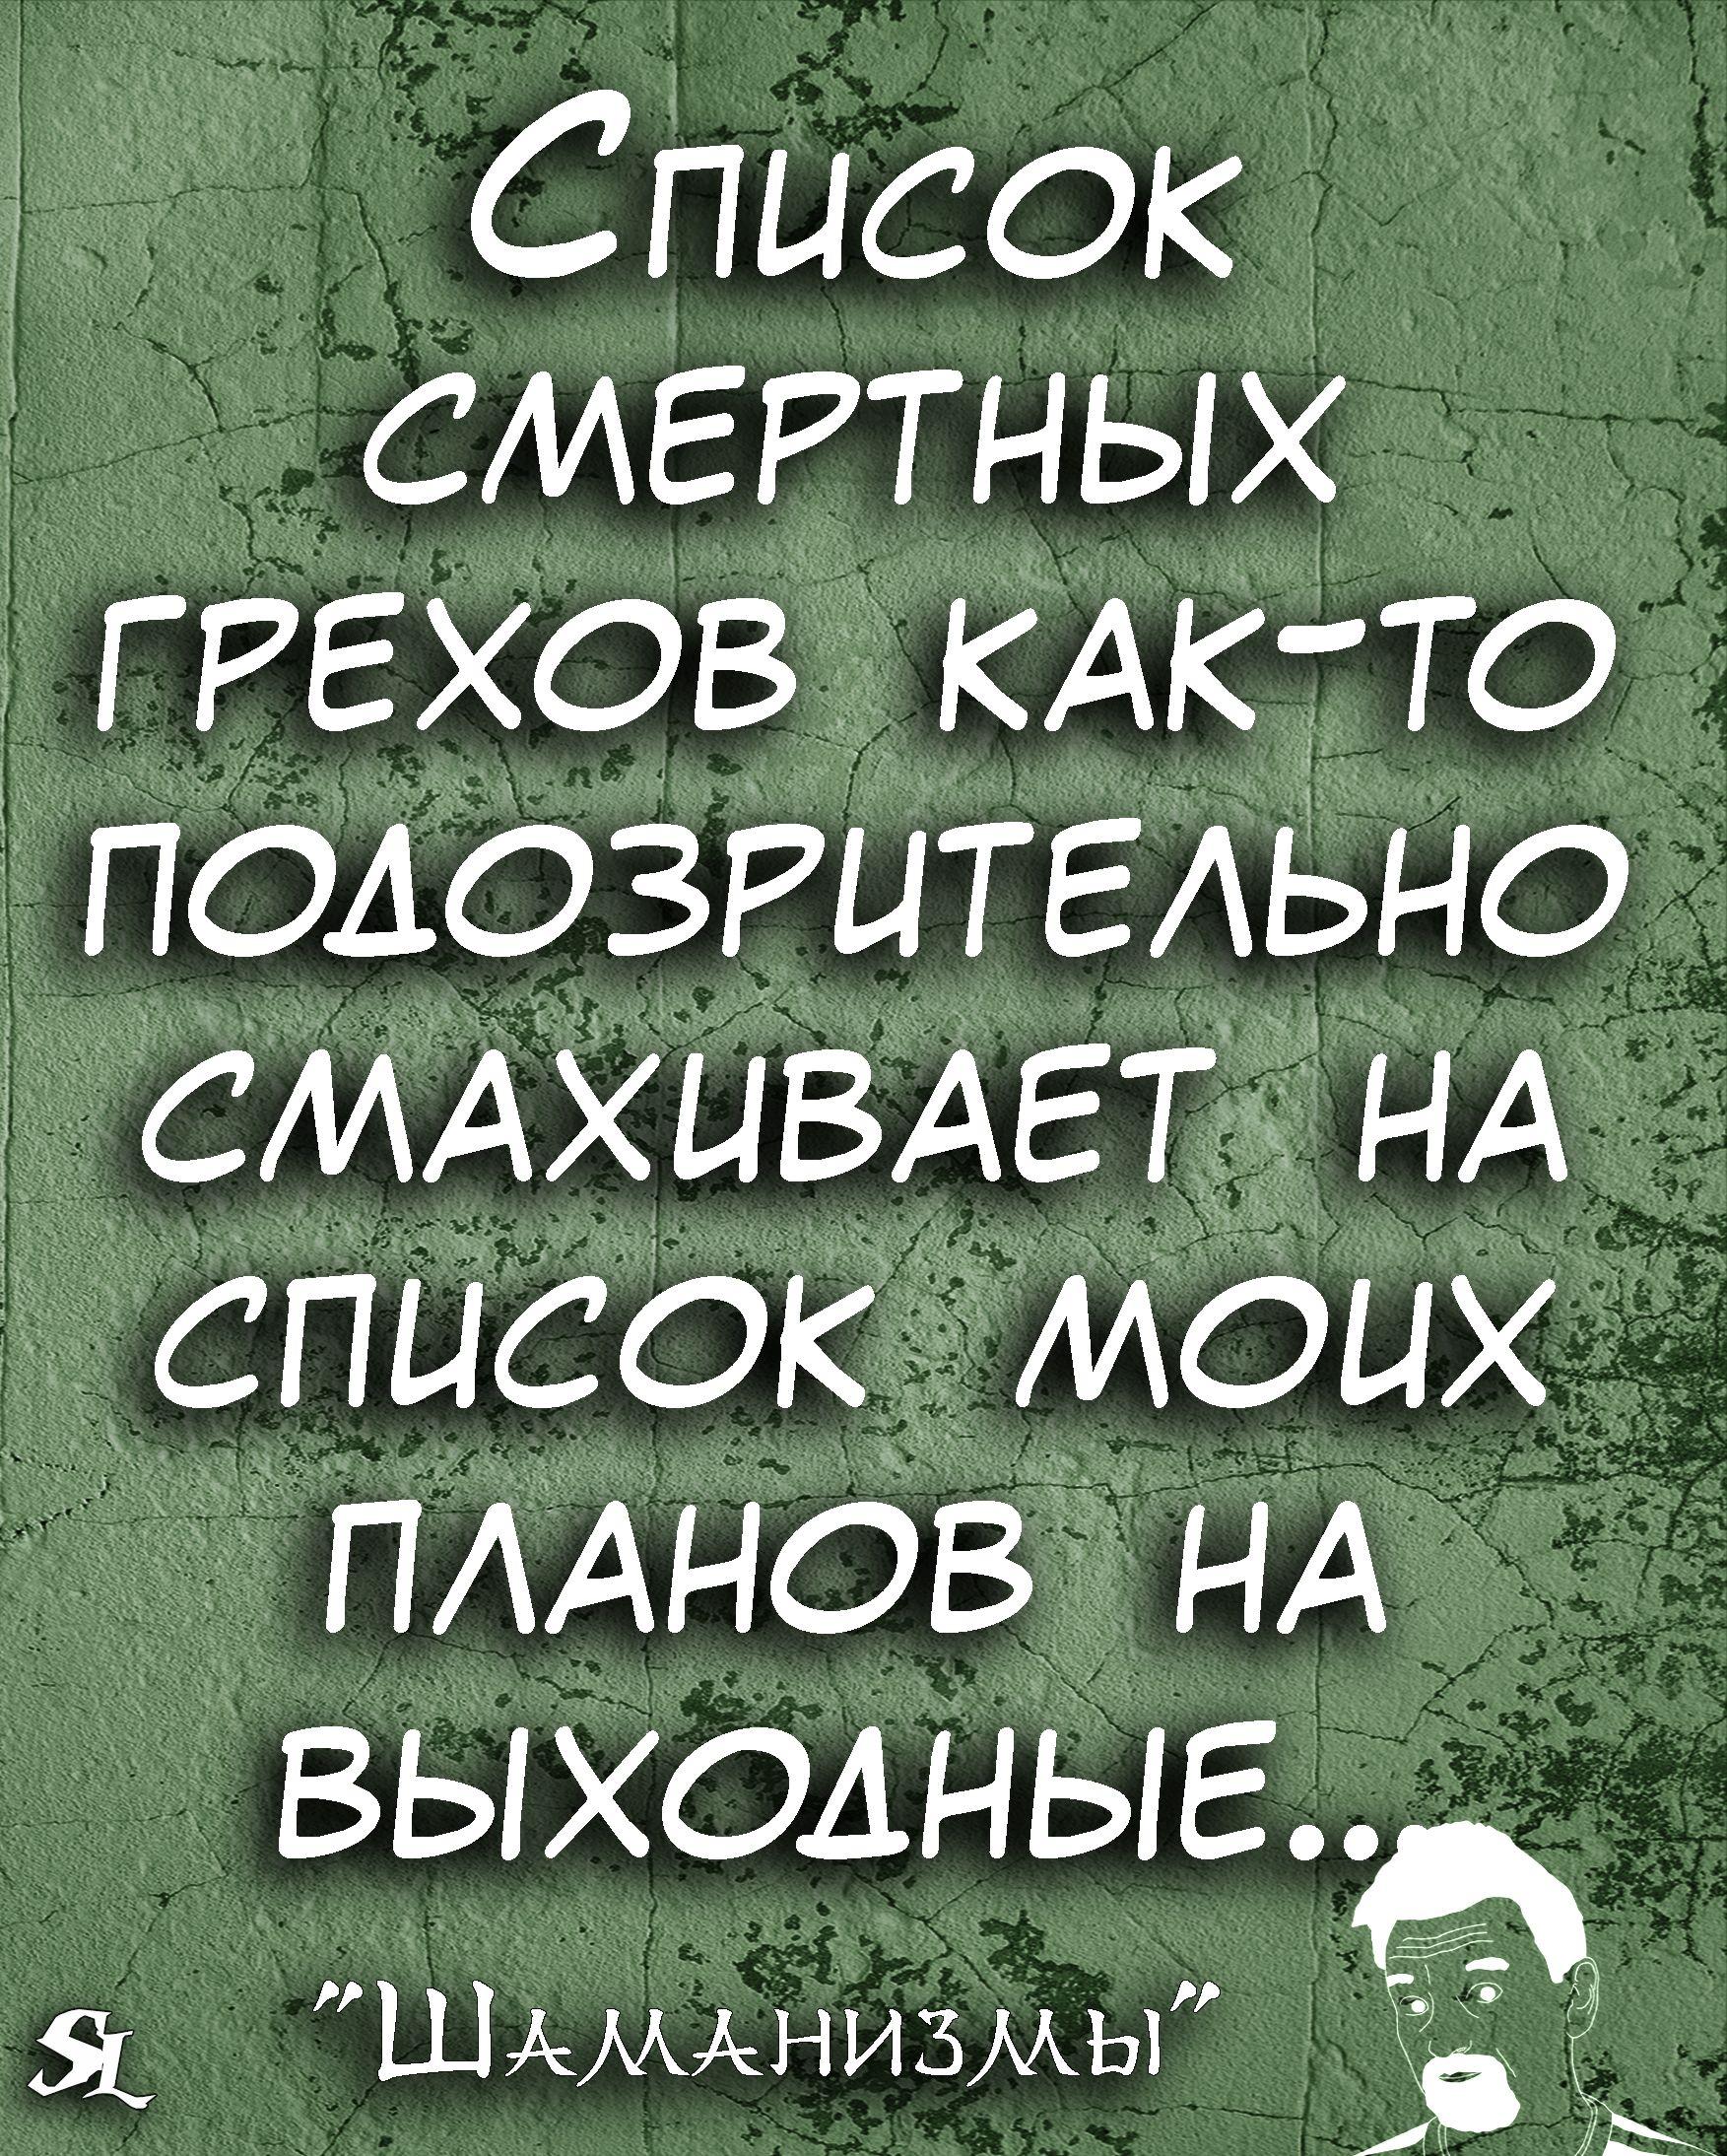 Shamanizmy Shutki Prikol Yumor Jokes Funny Humor Memes Clever Quotes Quotations Aphorisms